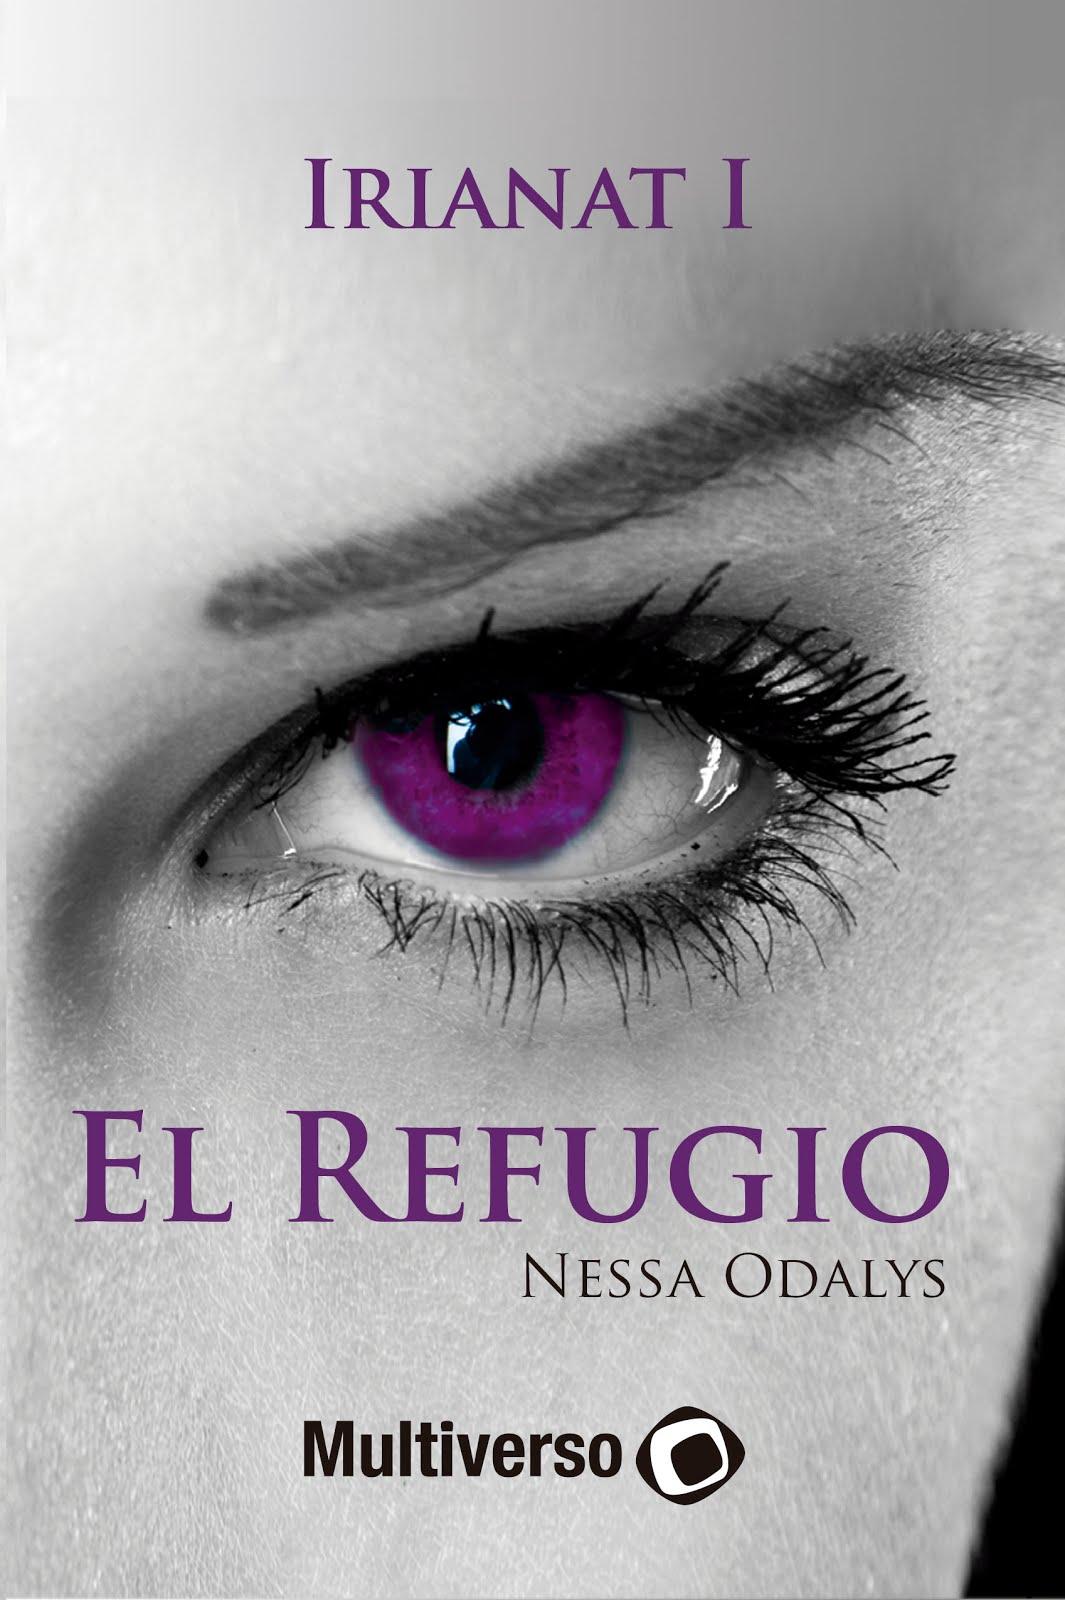 EL REFUGIO NESSA ODALYS